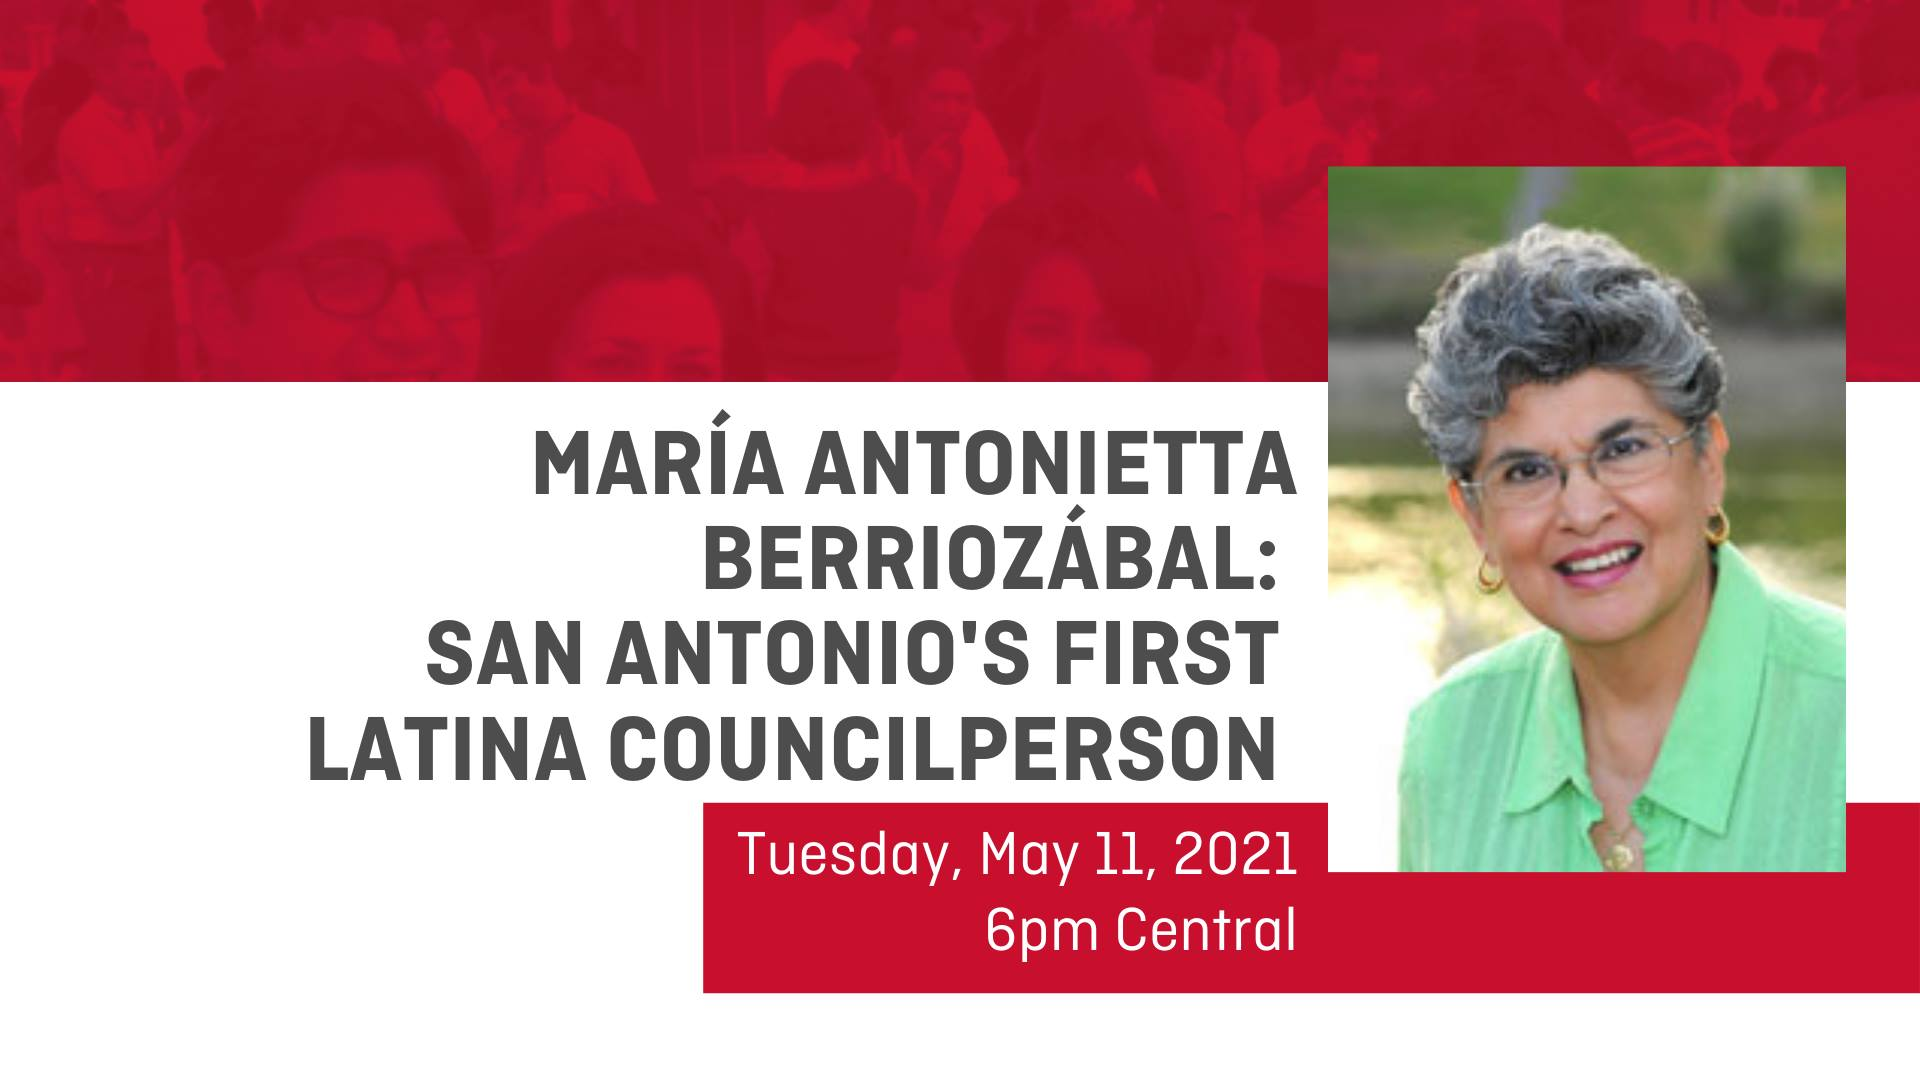 María Antonietta Berriozábal